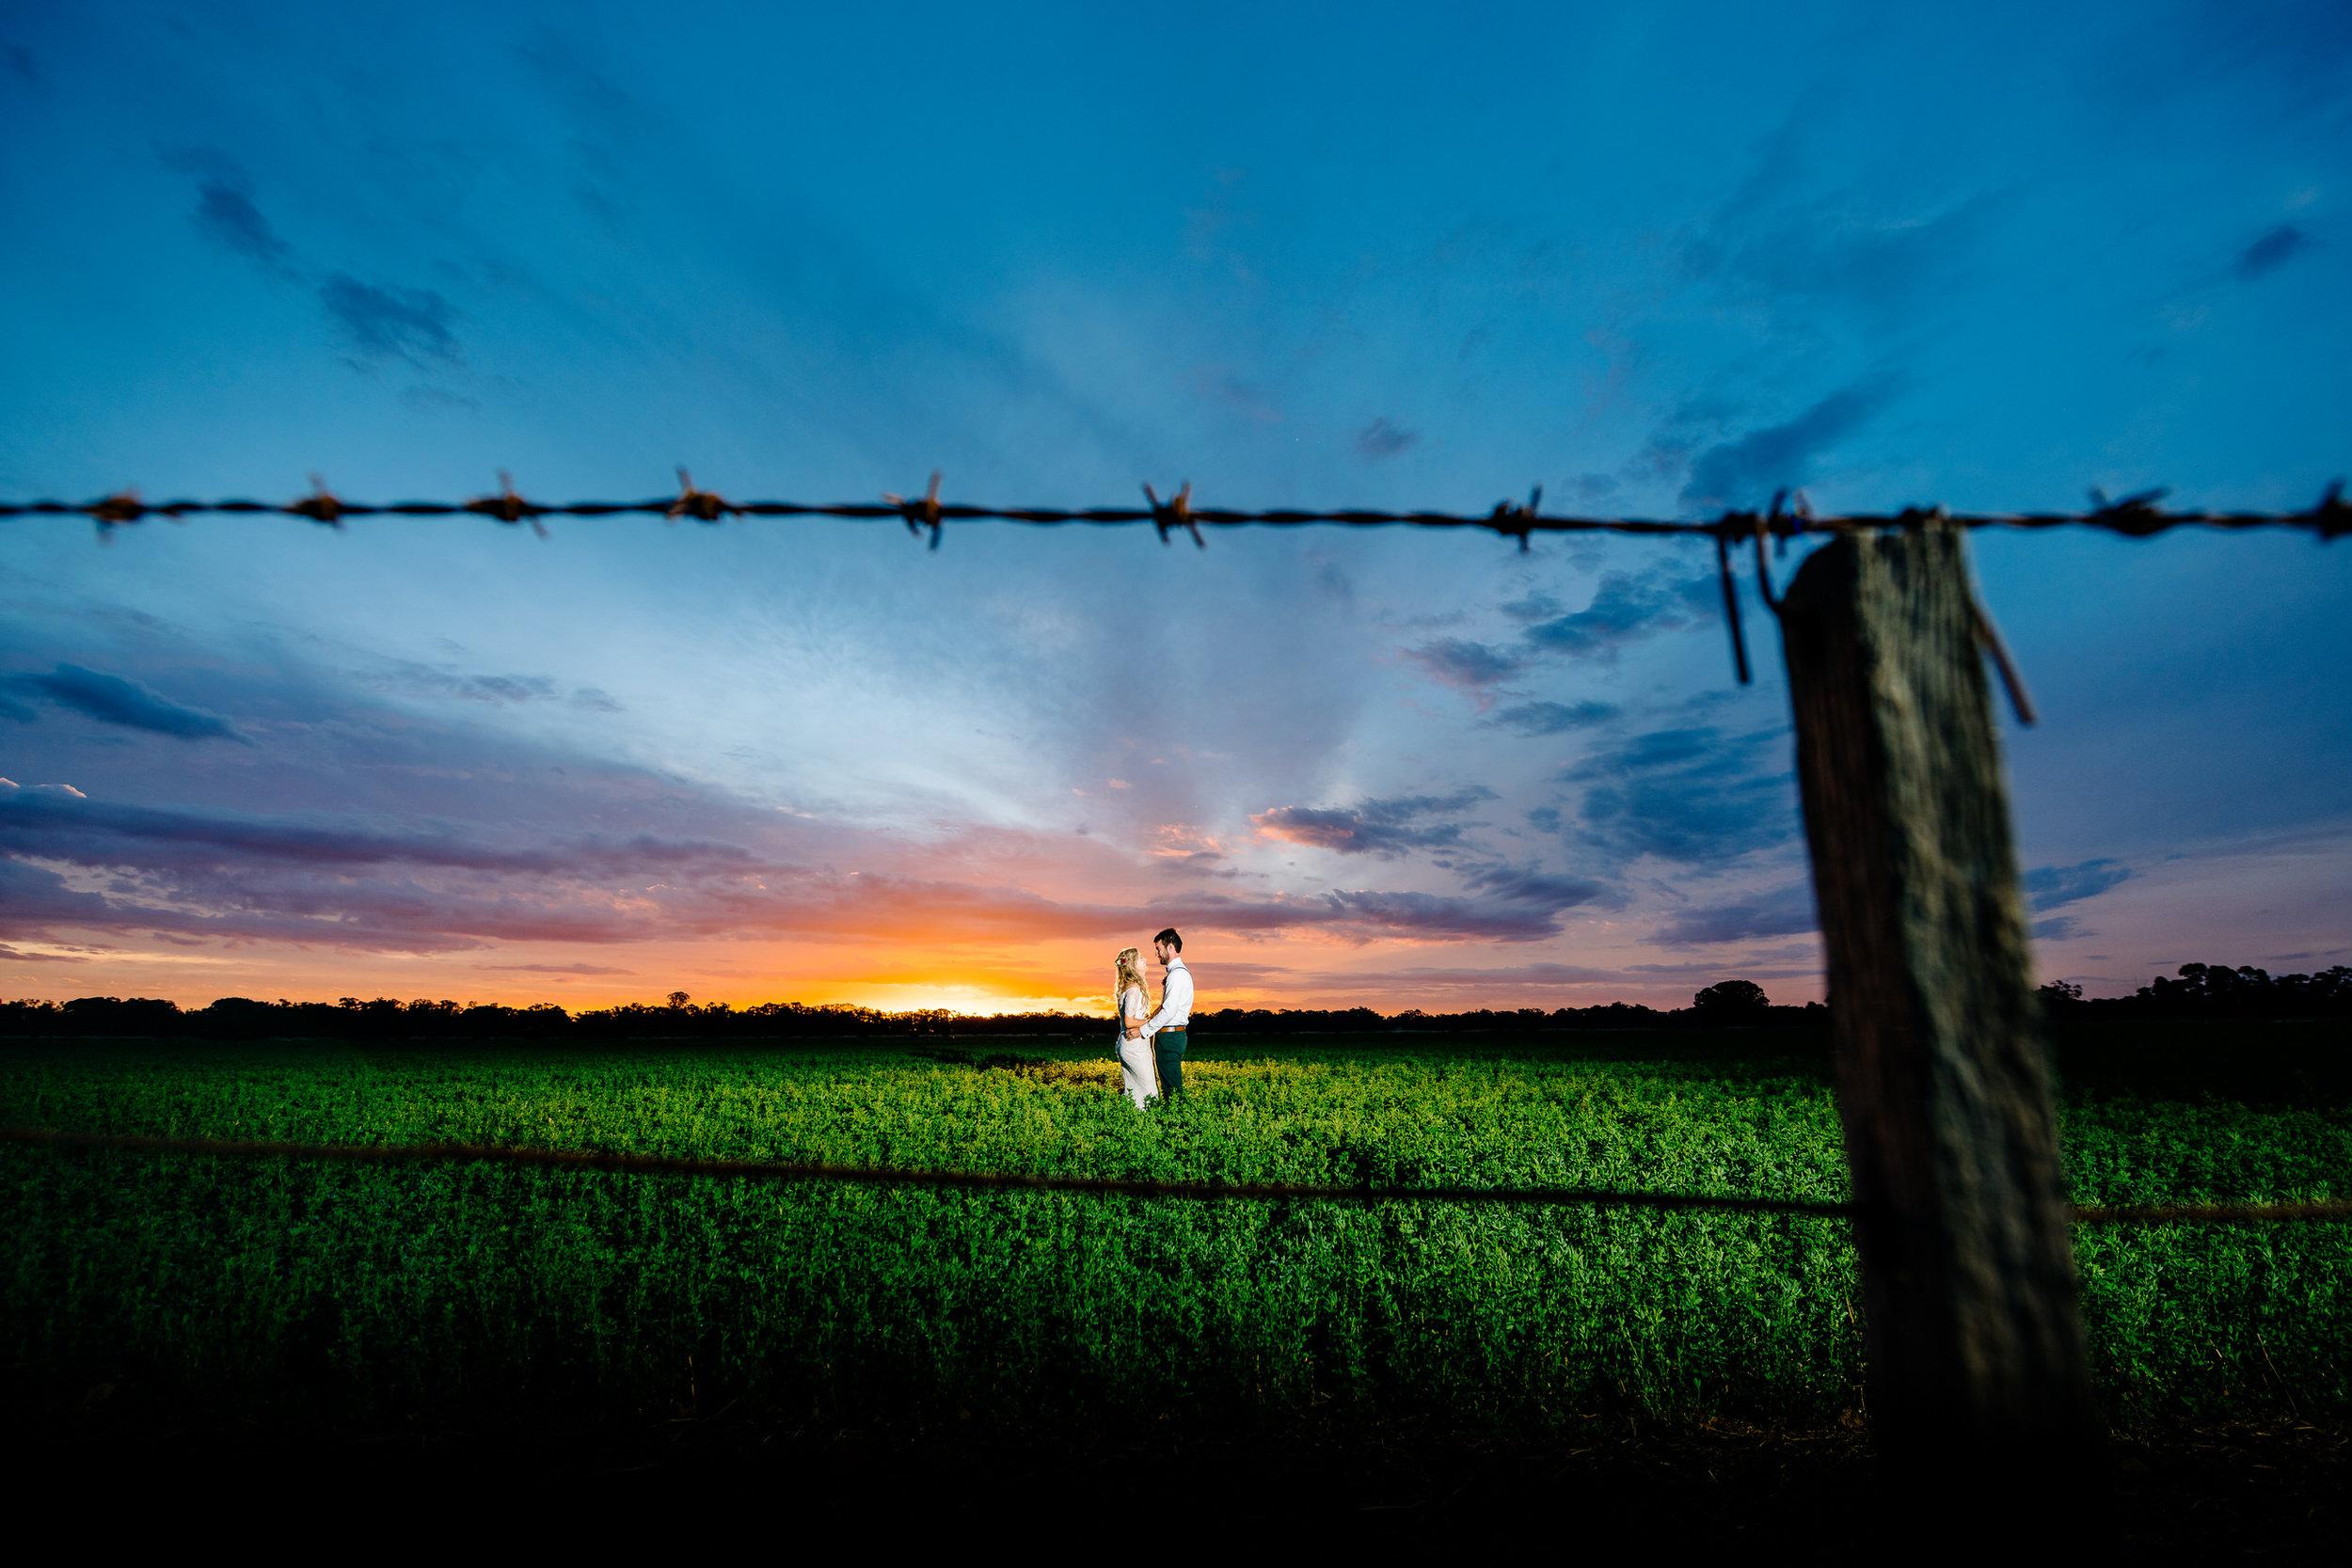 Justin_And_Jim_Photography_Backyard_Wedding223.JPG